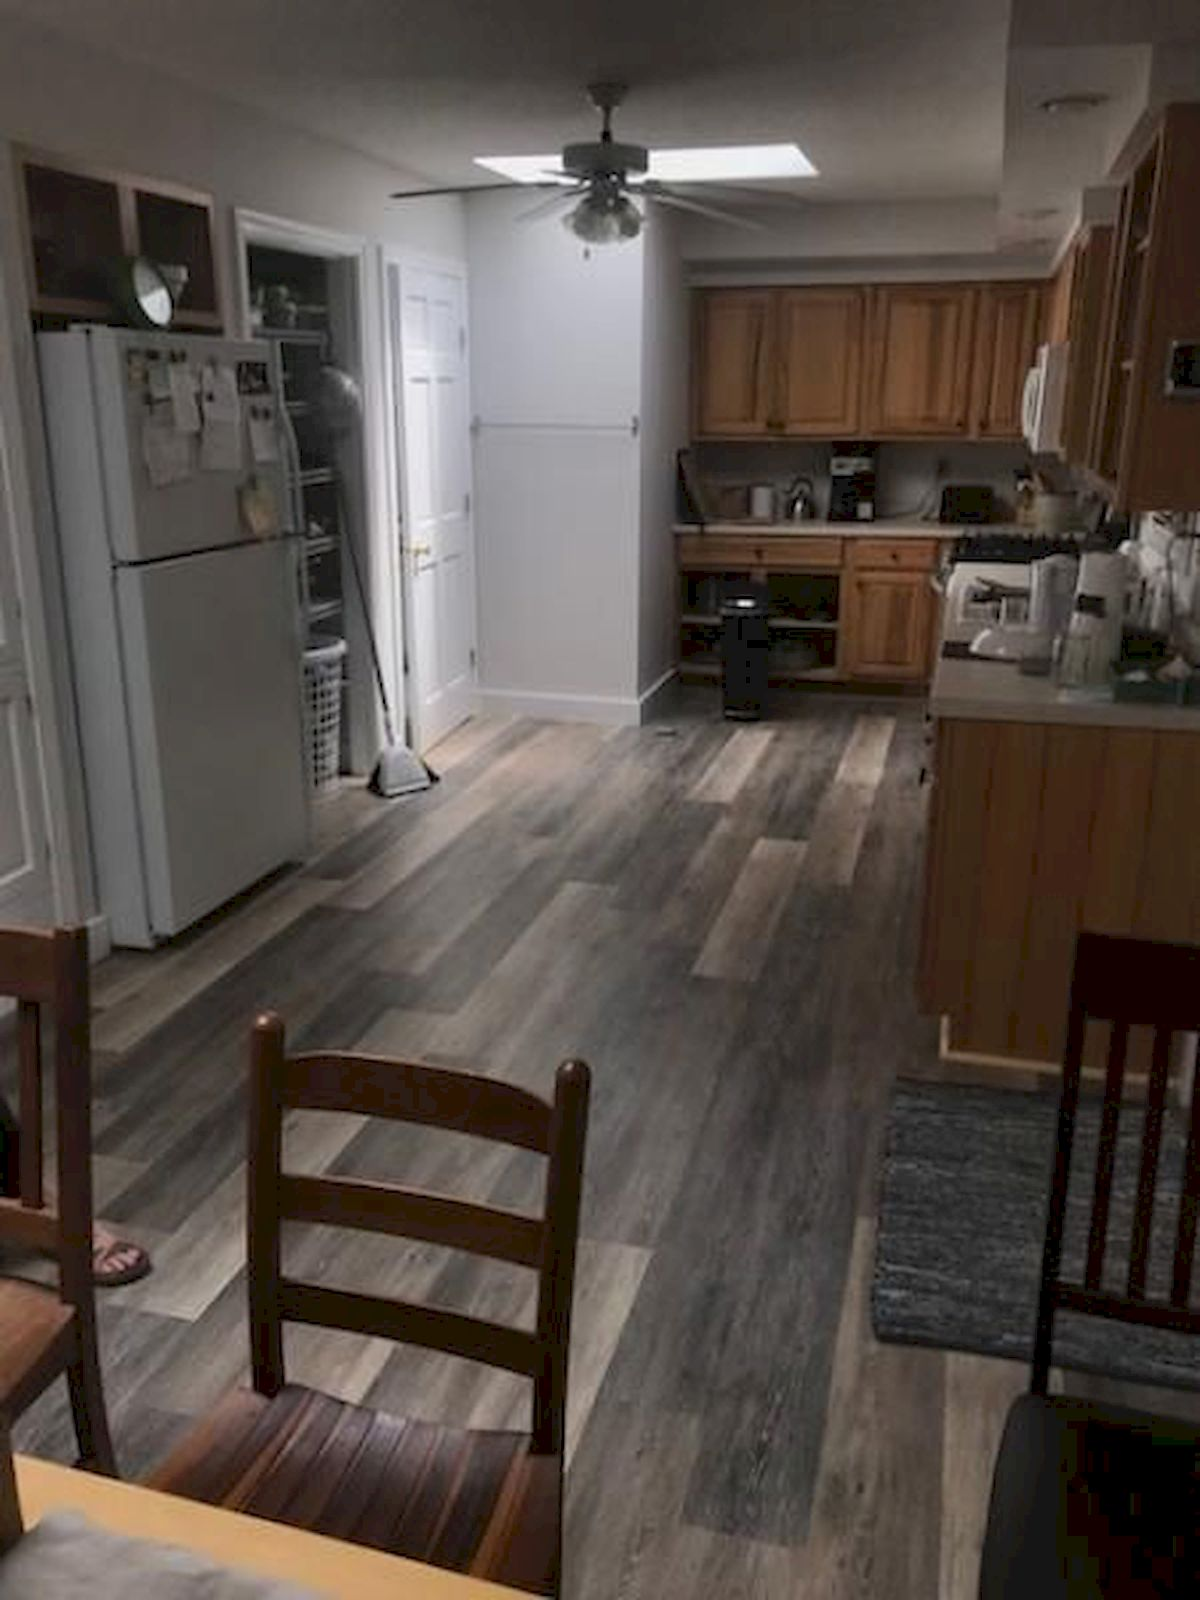 80 Gorgeous Hardwood Floor Ideas for Interior Home (62)